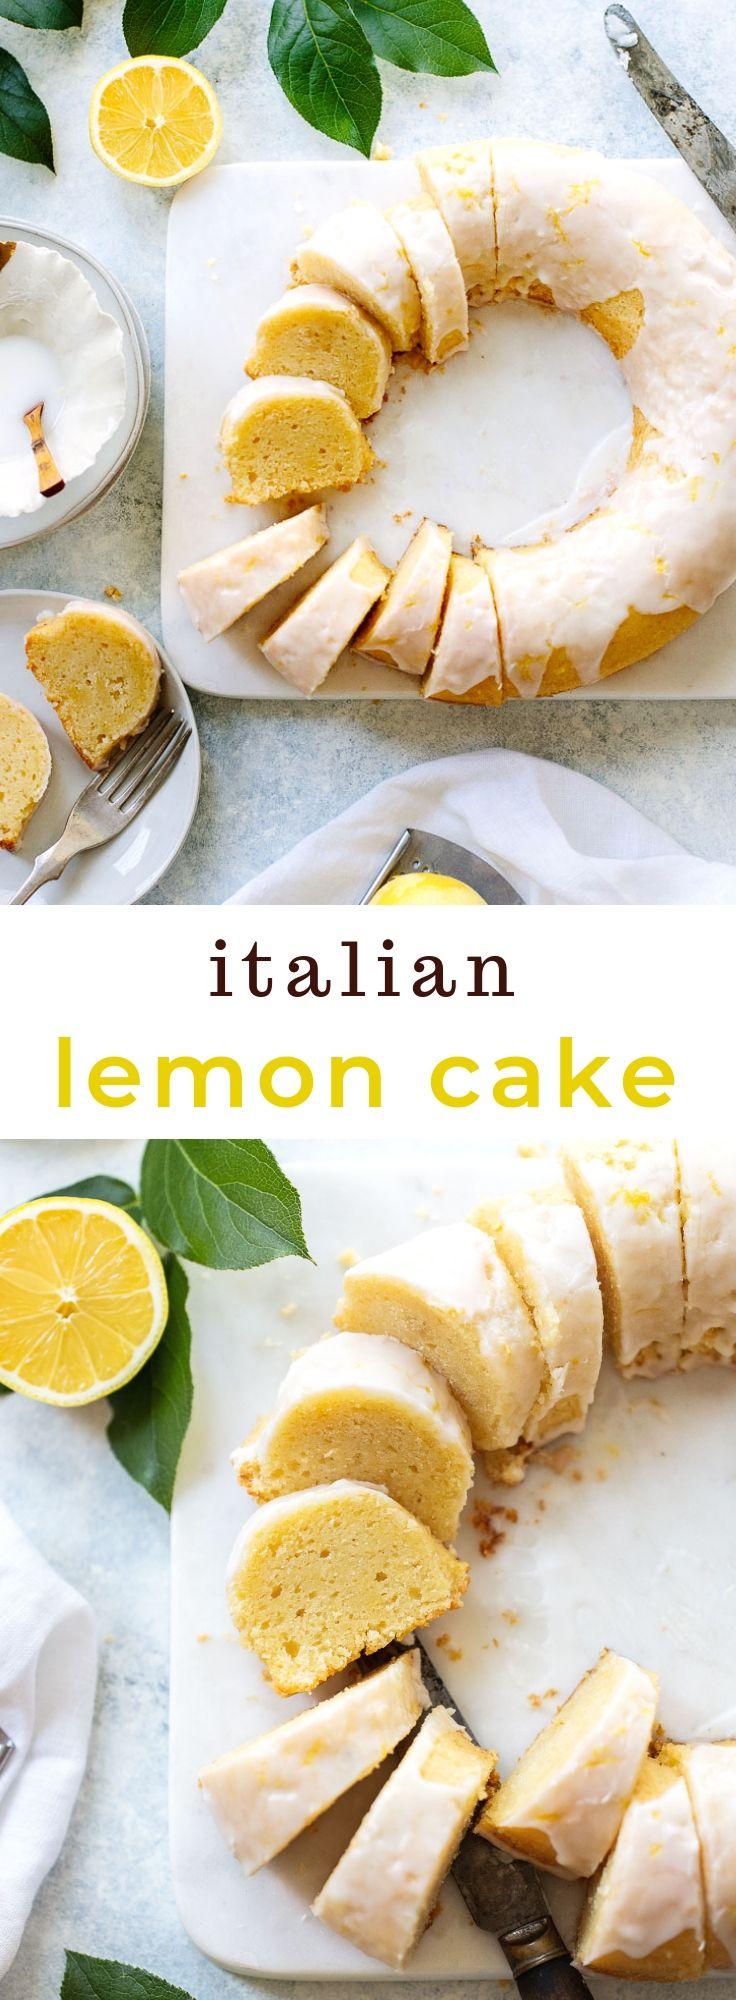 Super-Moist Double Lemon Cake mit Limoncello-Glasur – Einfacher Zitronenkuchen mit …   – Citrus